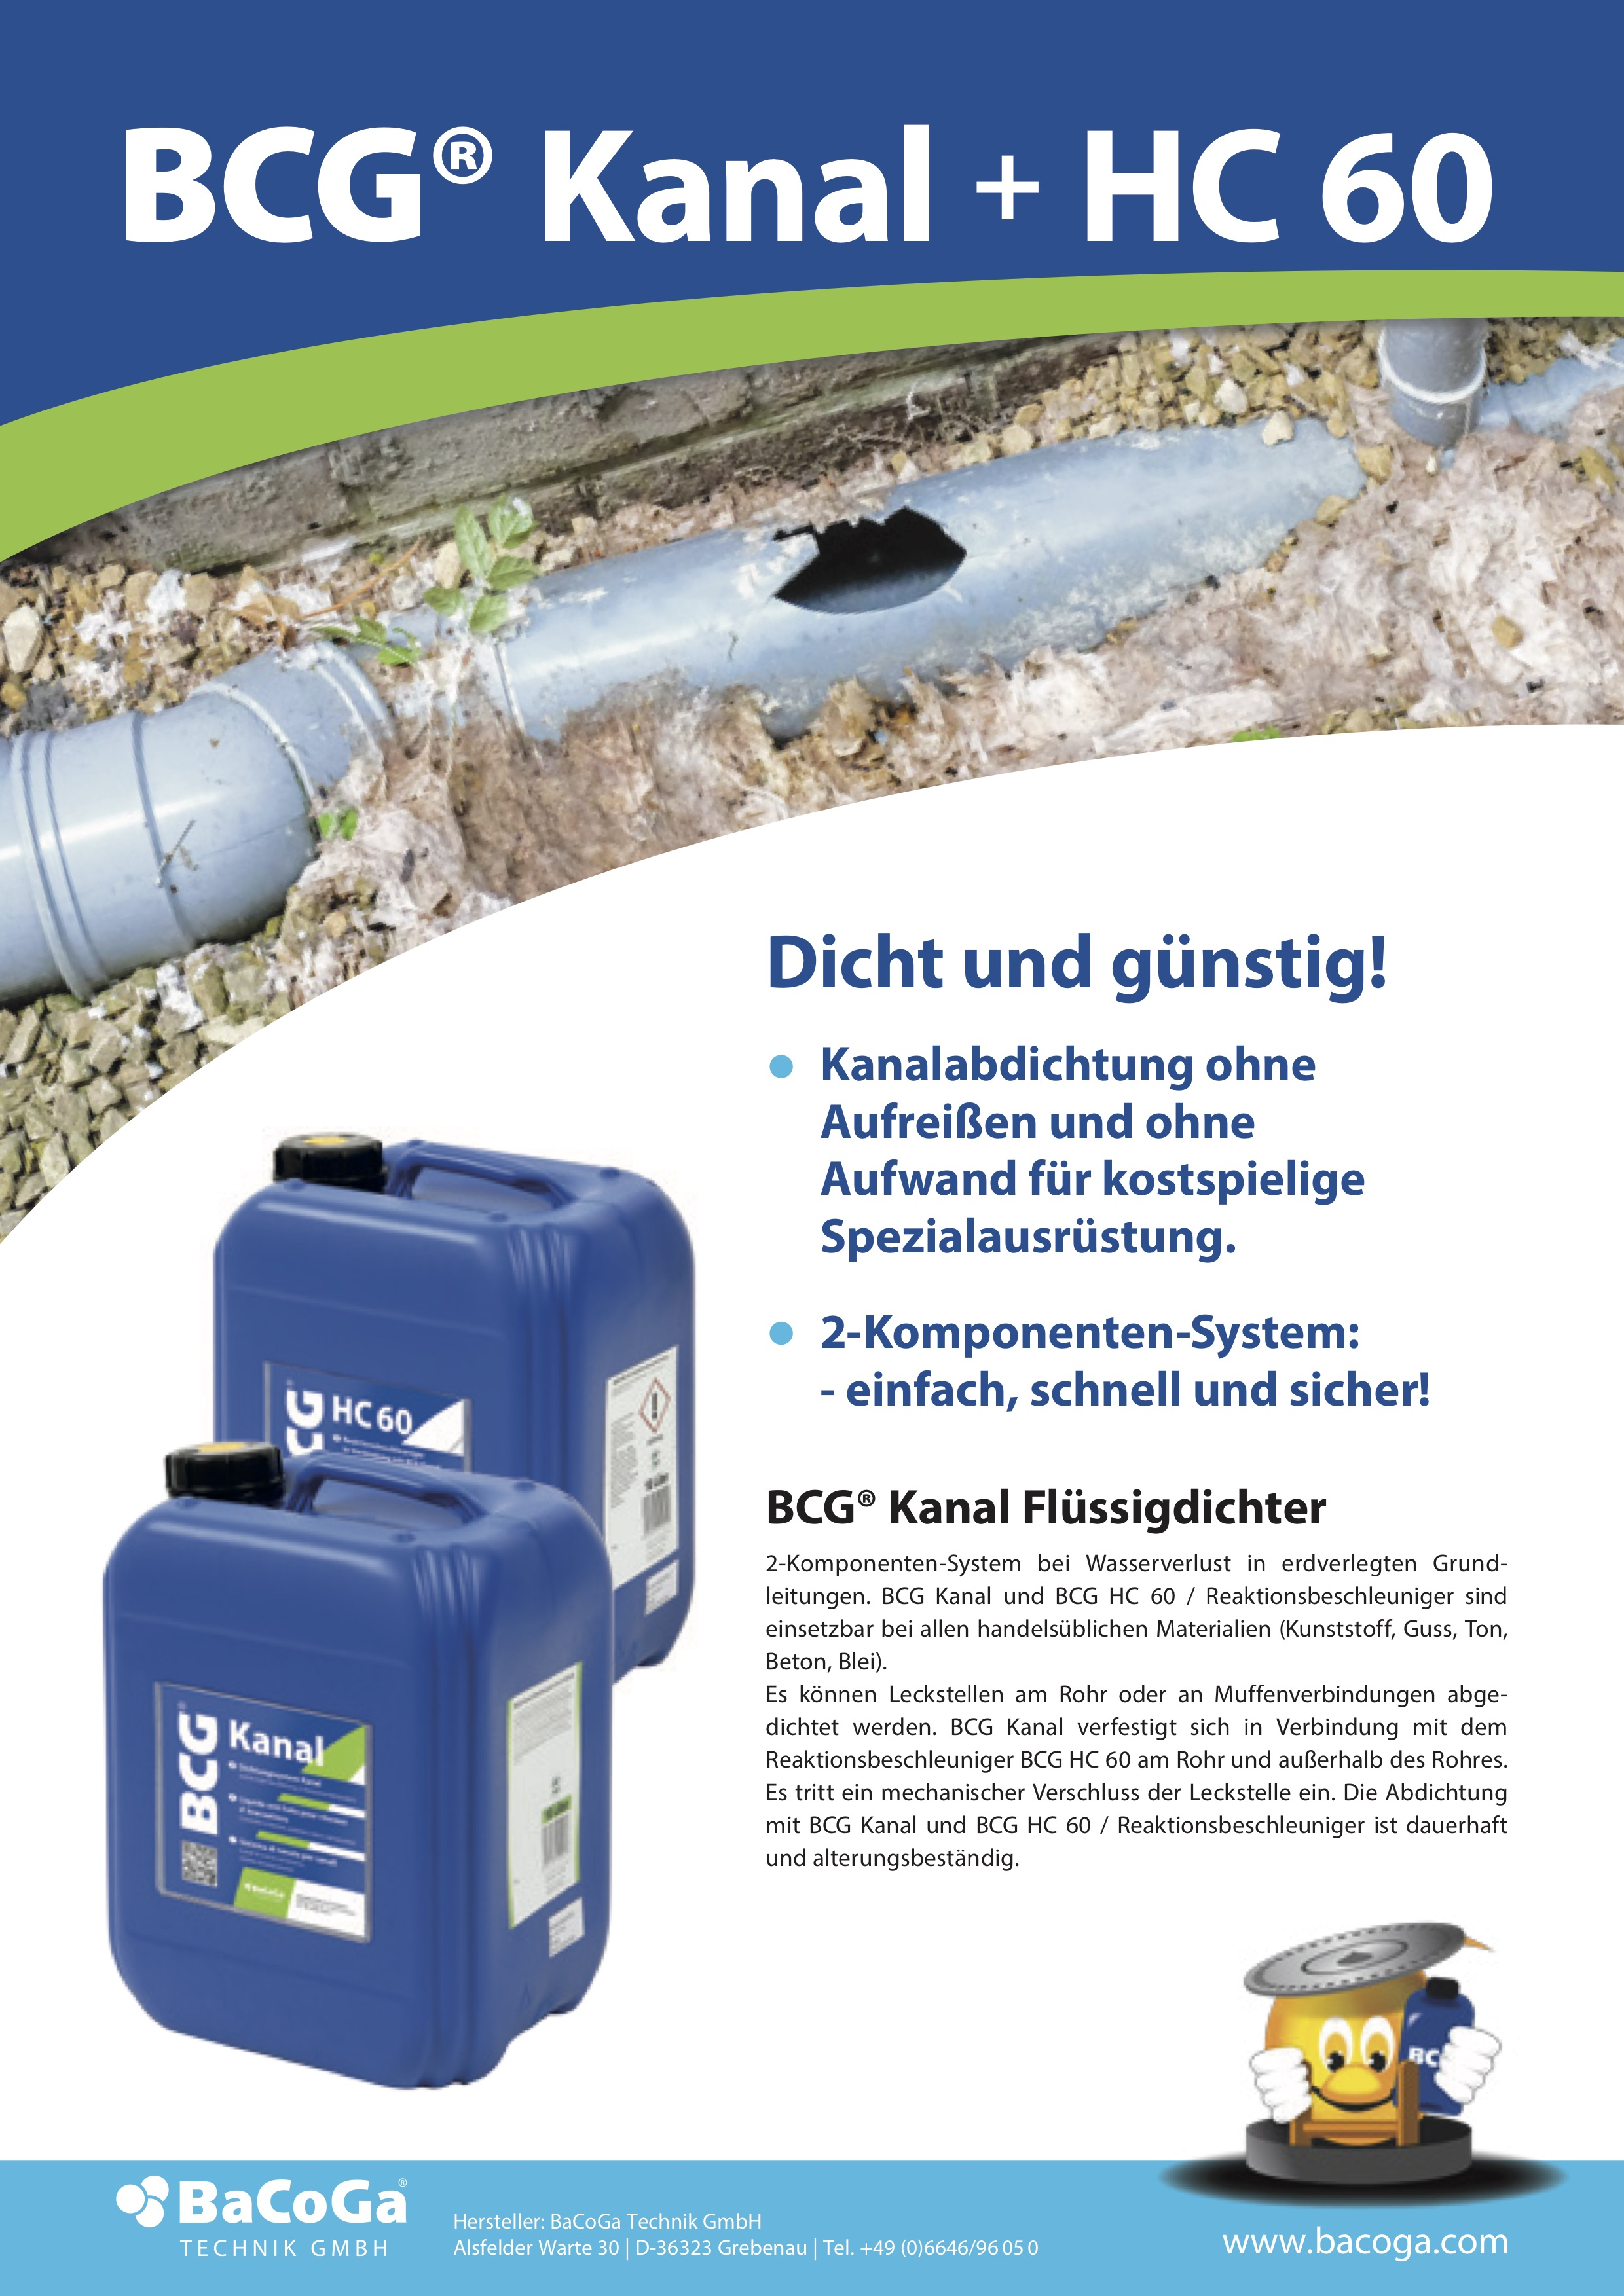 BCG Kanal + HC 60